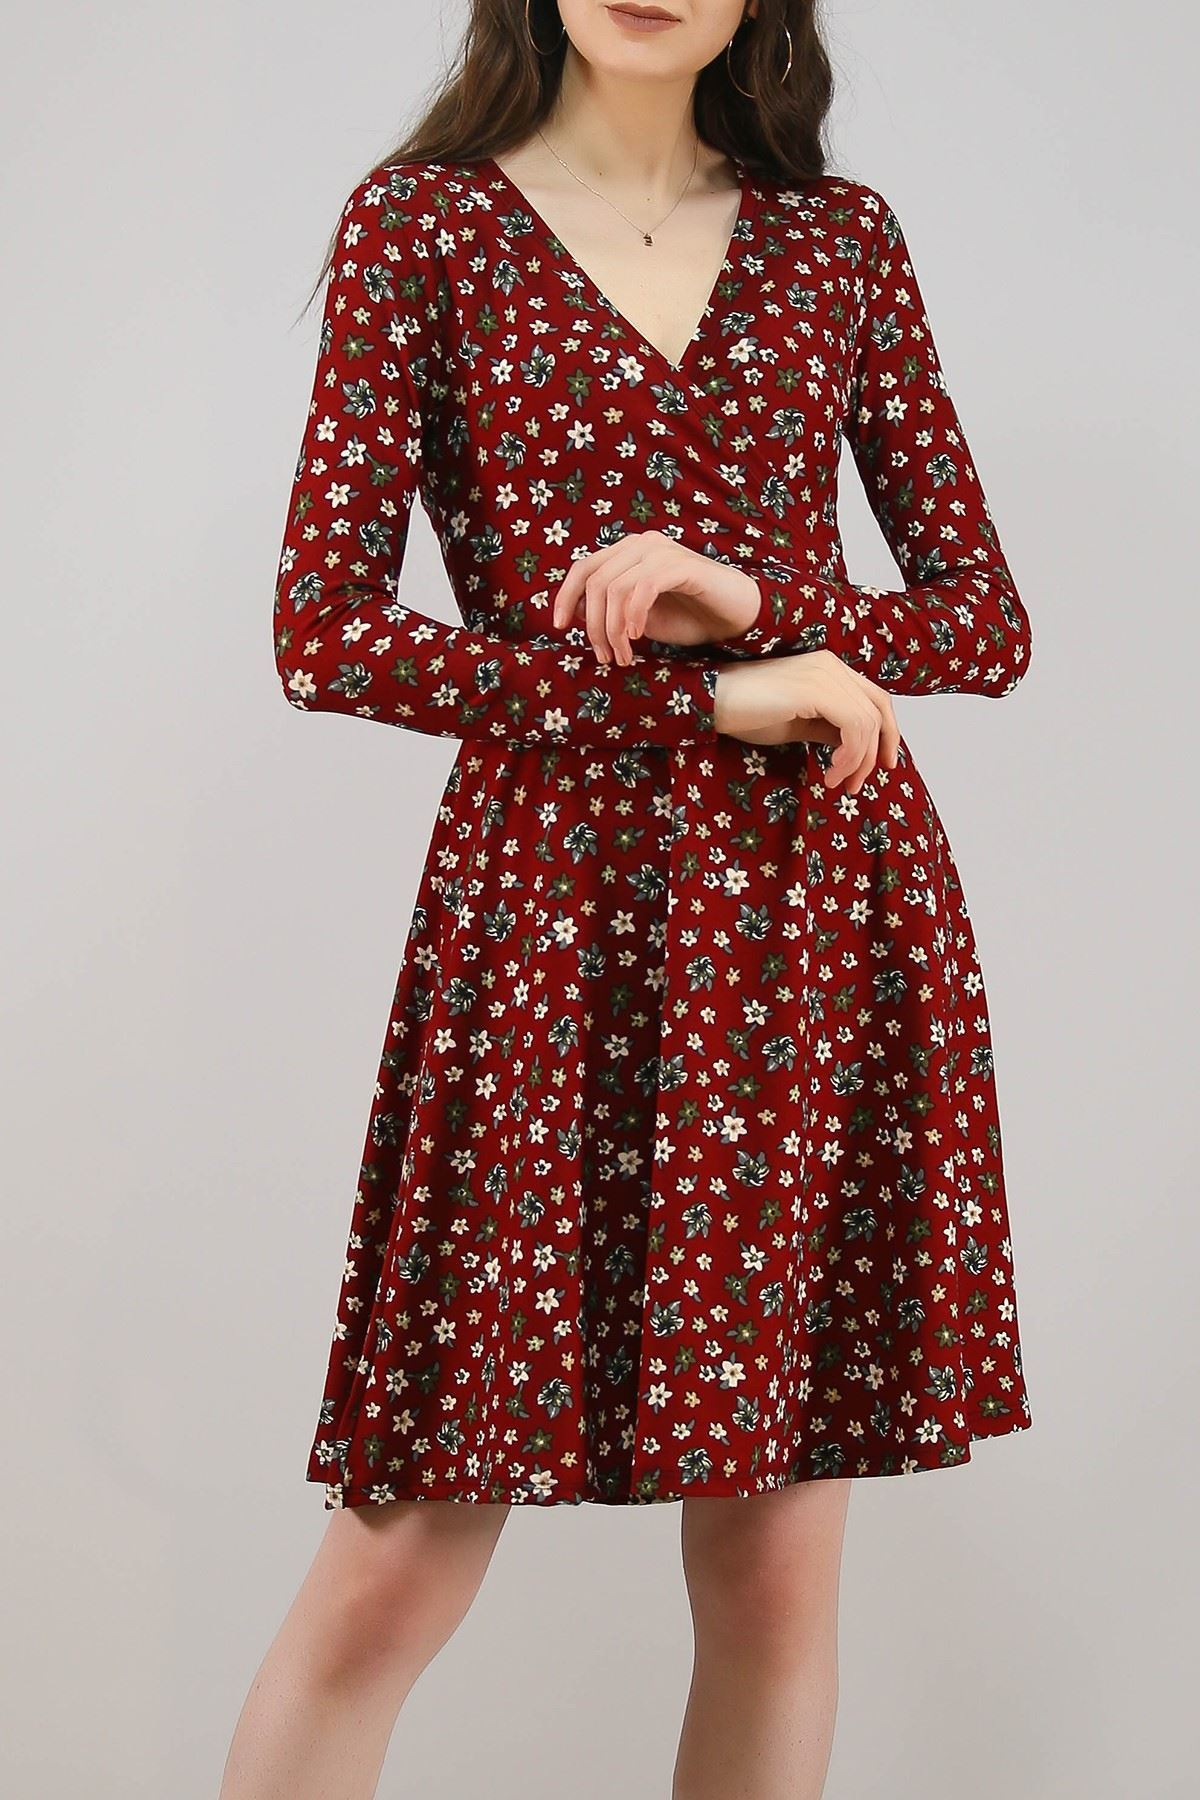 Desenli Elbise Bordo - 4986.716.